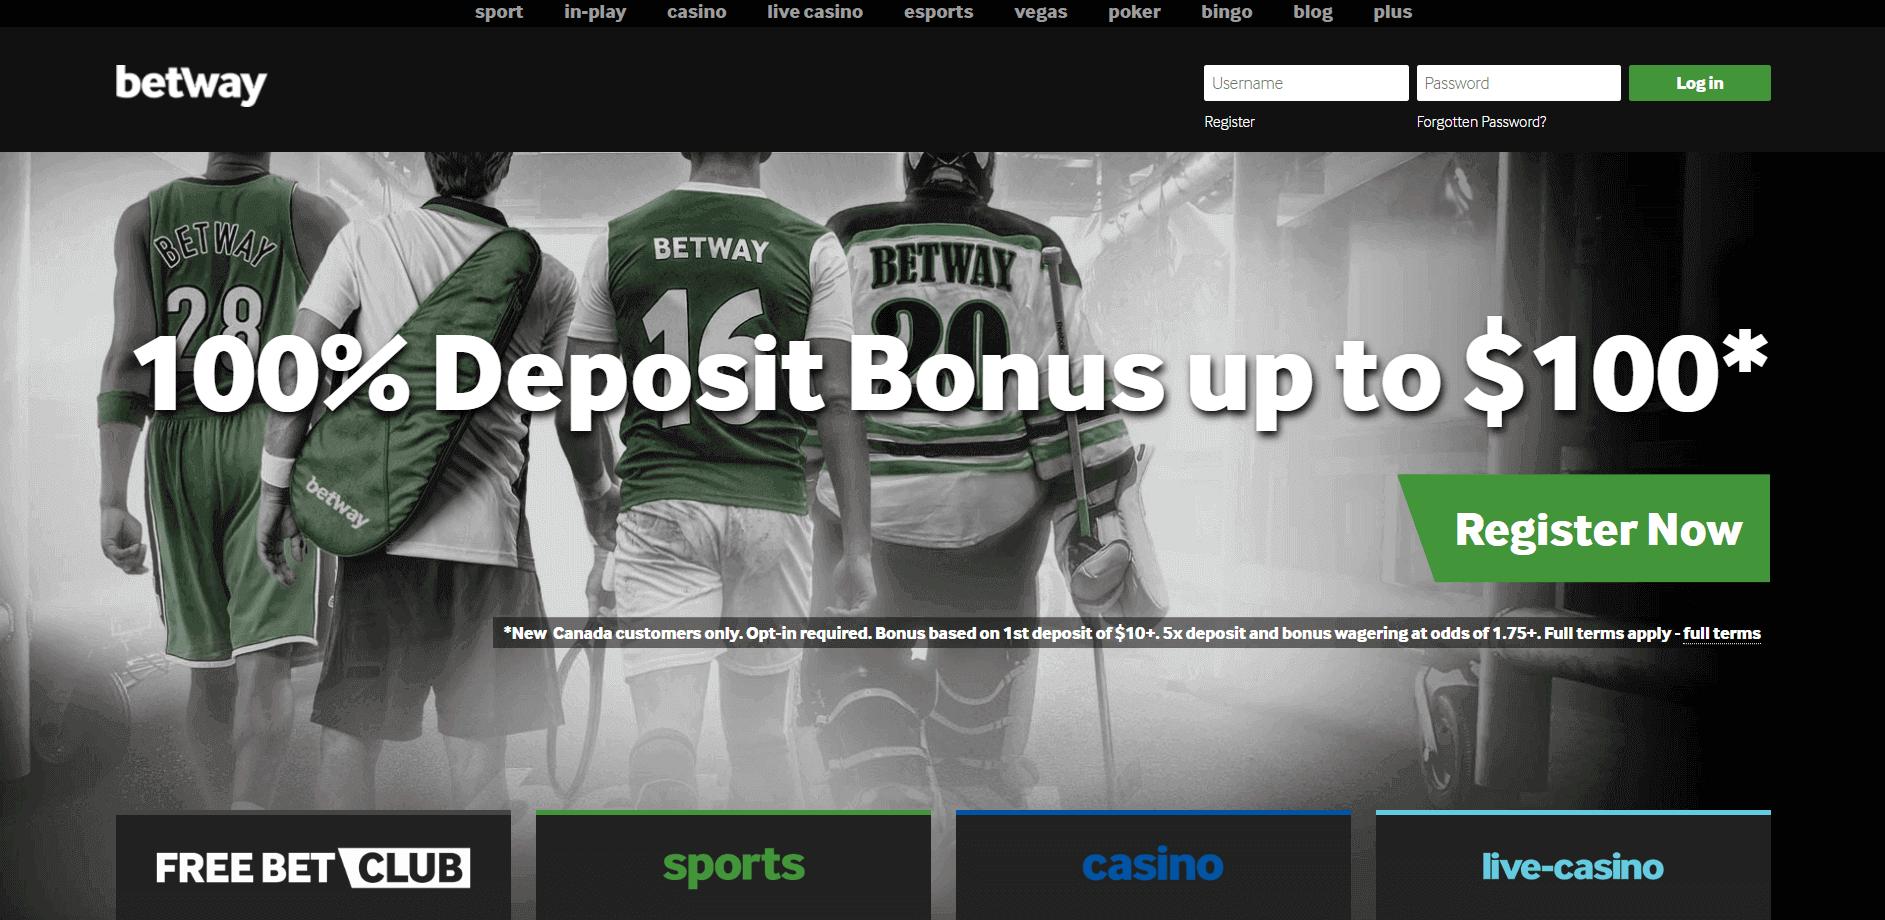 Betway Online Casino and Sportsbook screenshot with $100 Bonus Offer